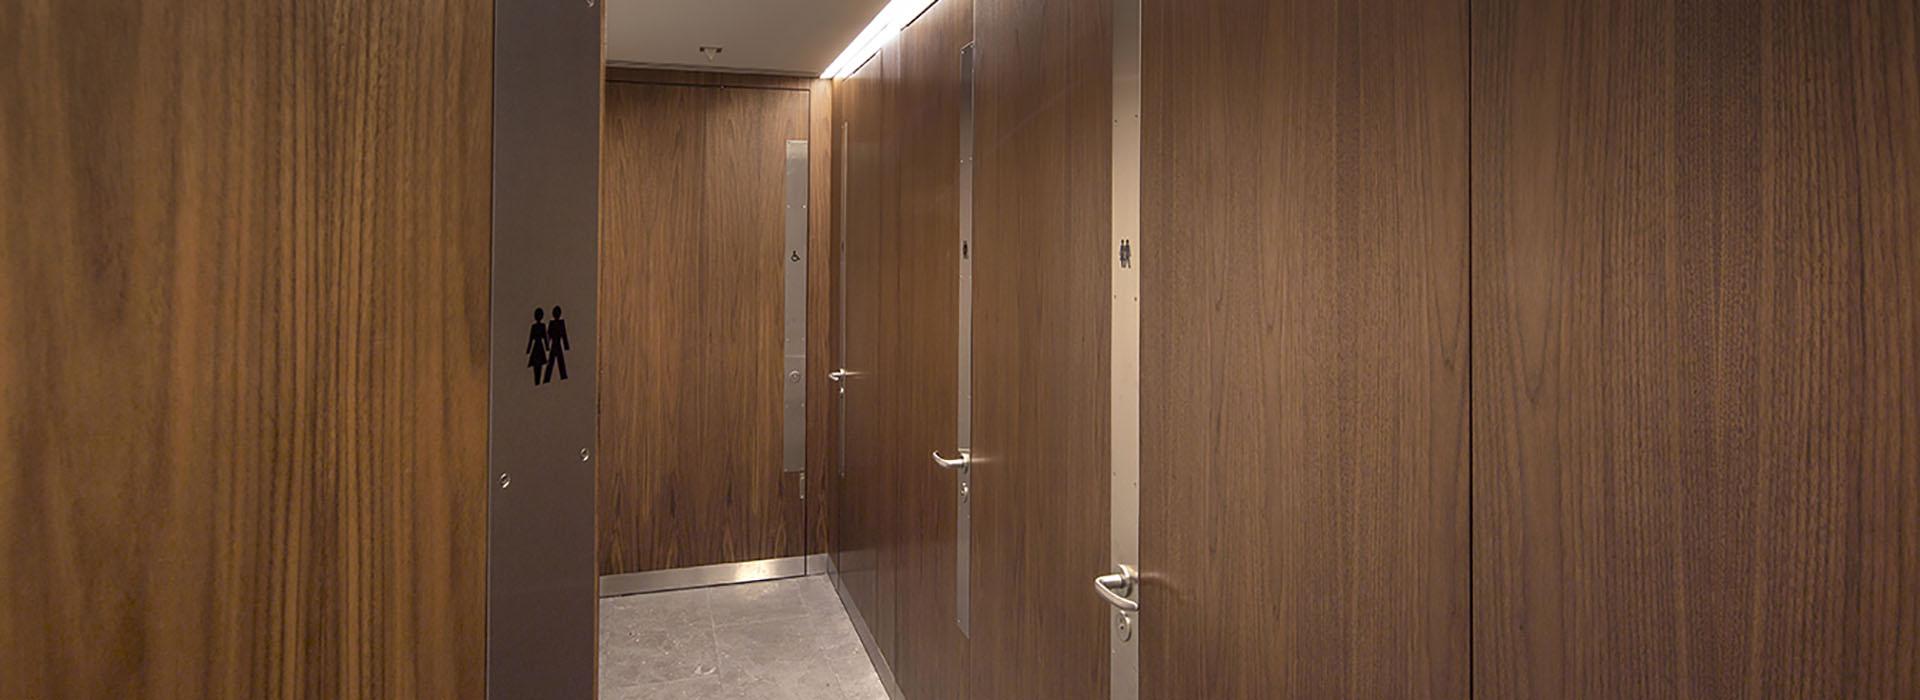 Shadbolt_8_St_James_Square_veneered_toilet_doors